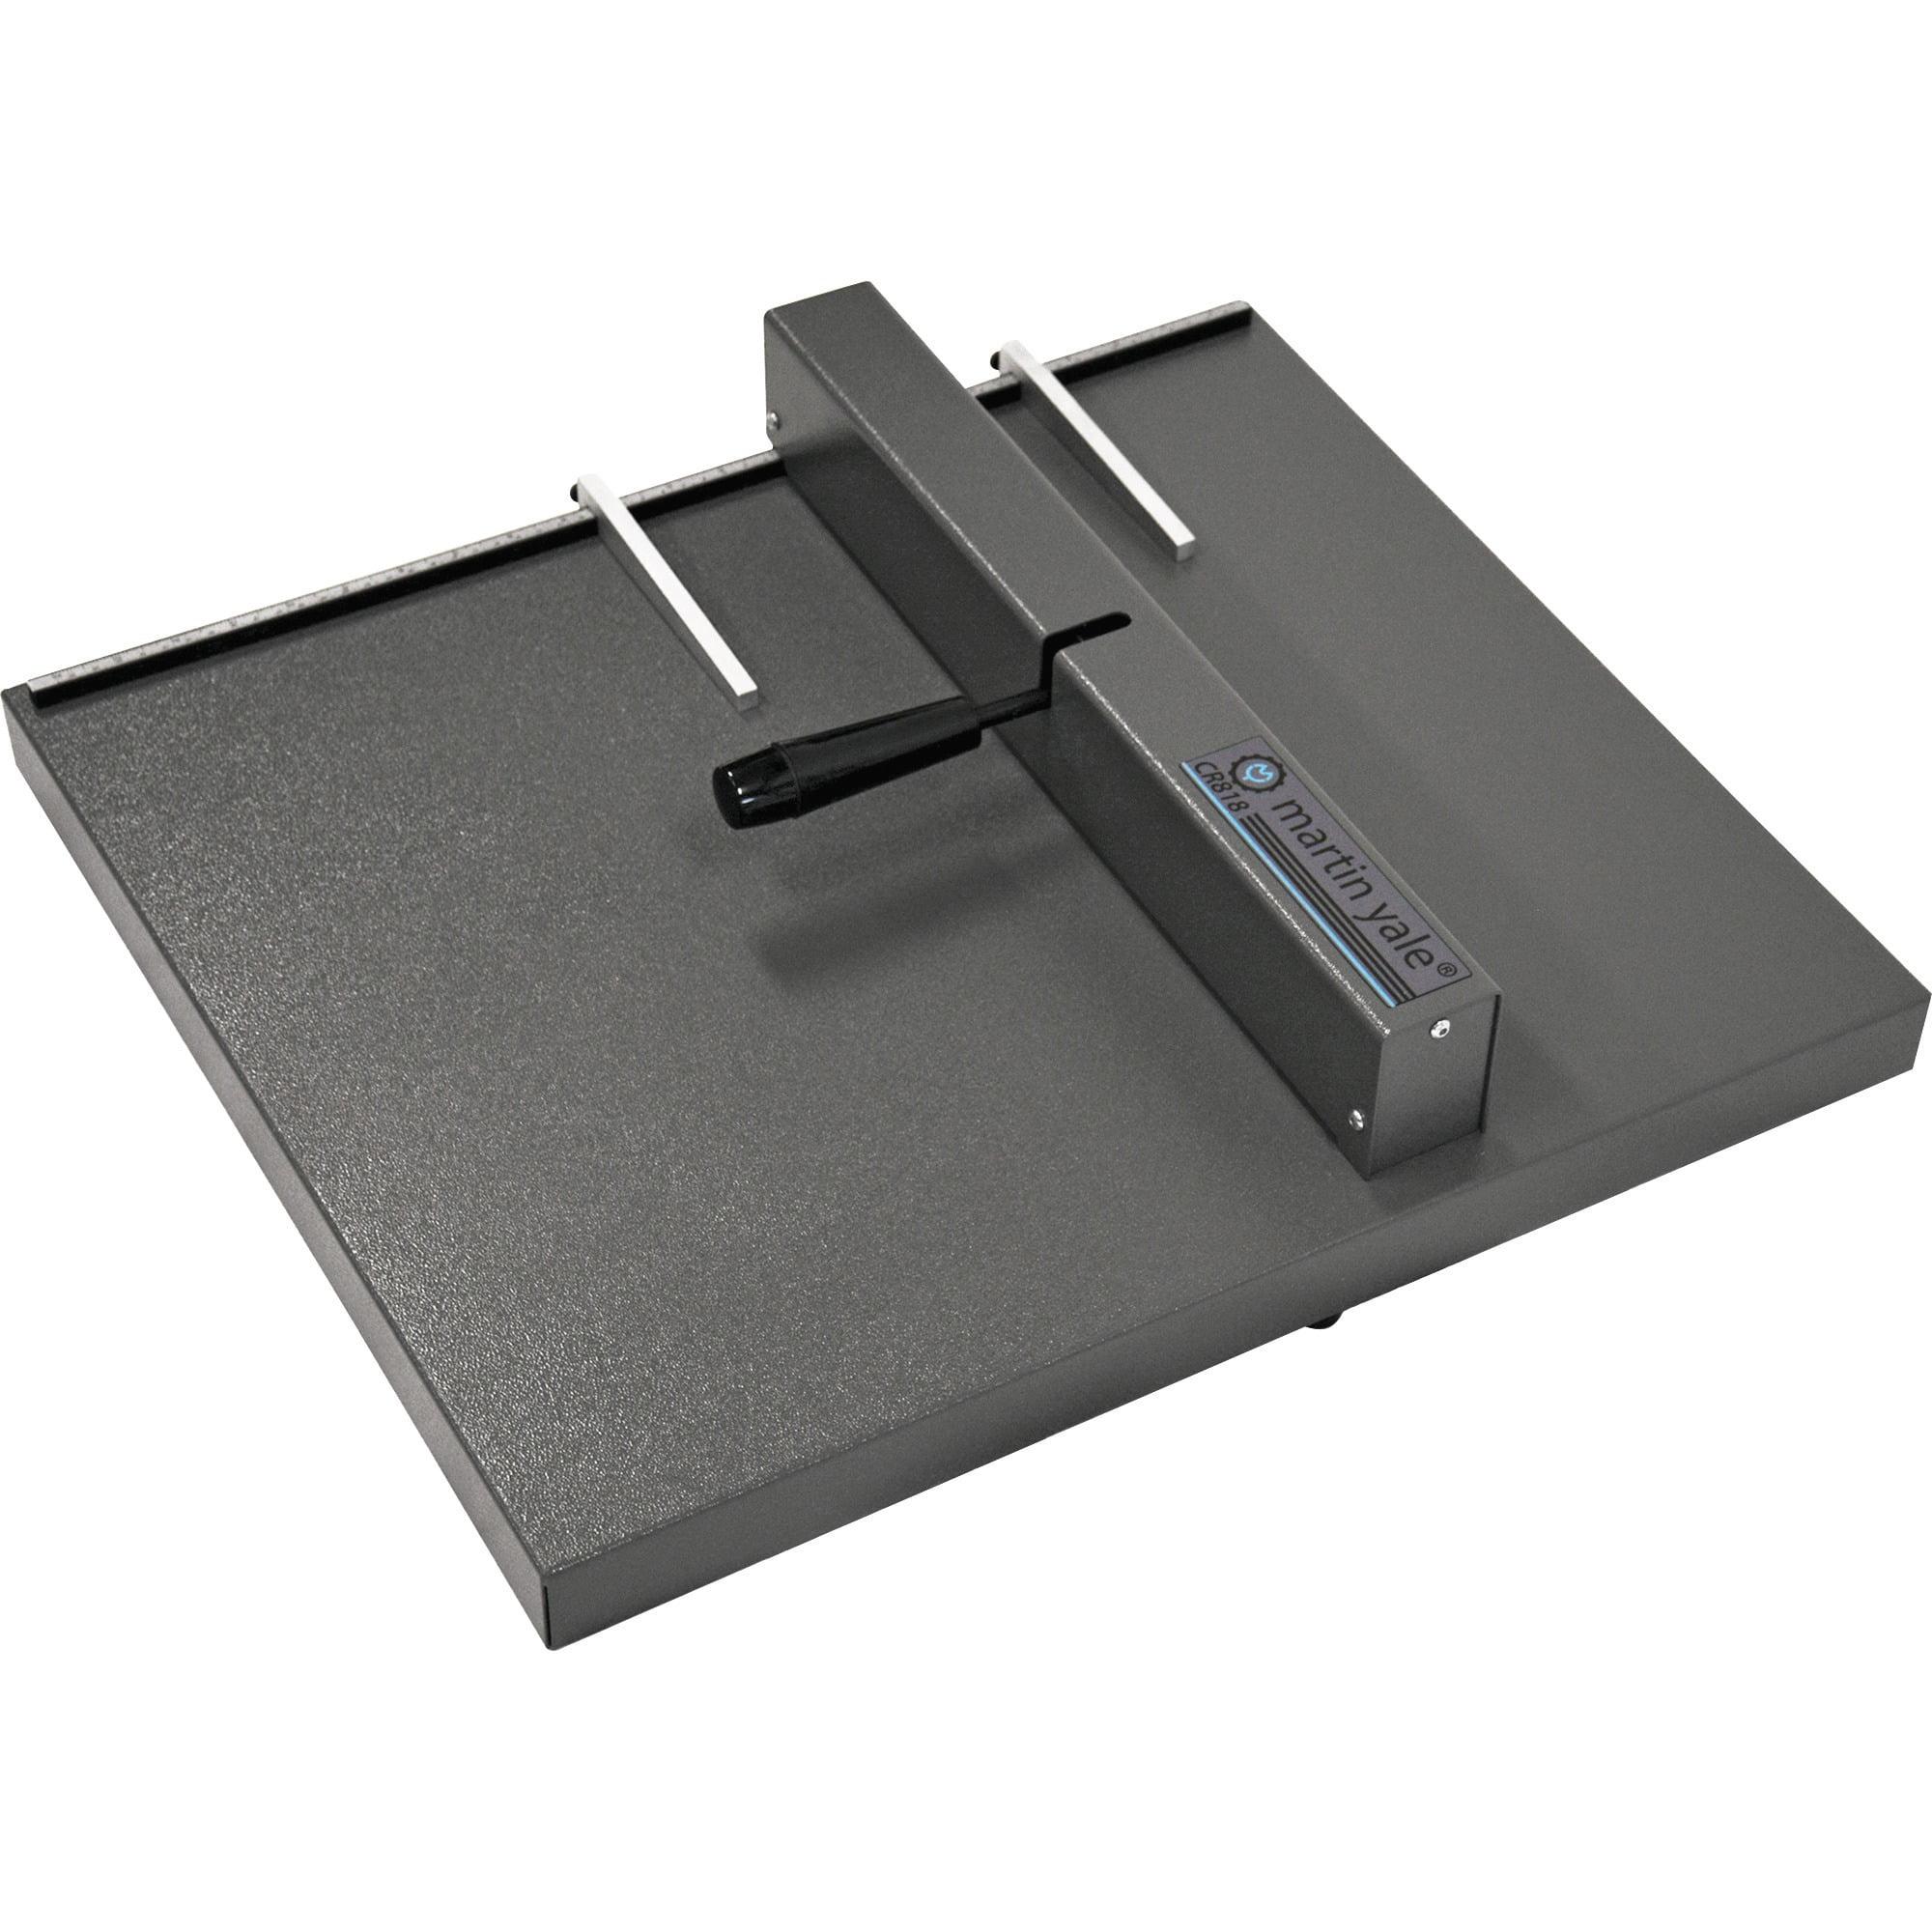 Premier, PRECR818, CR818 Manual Smart Creaser, 1 / Each, Gray